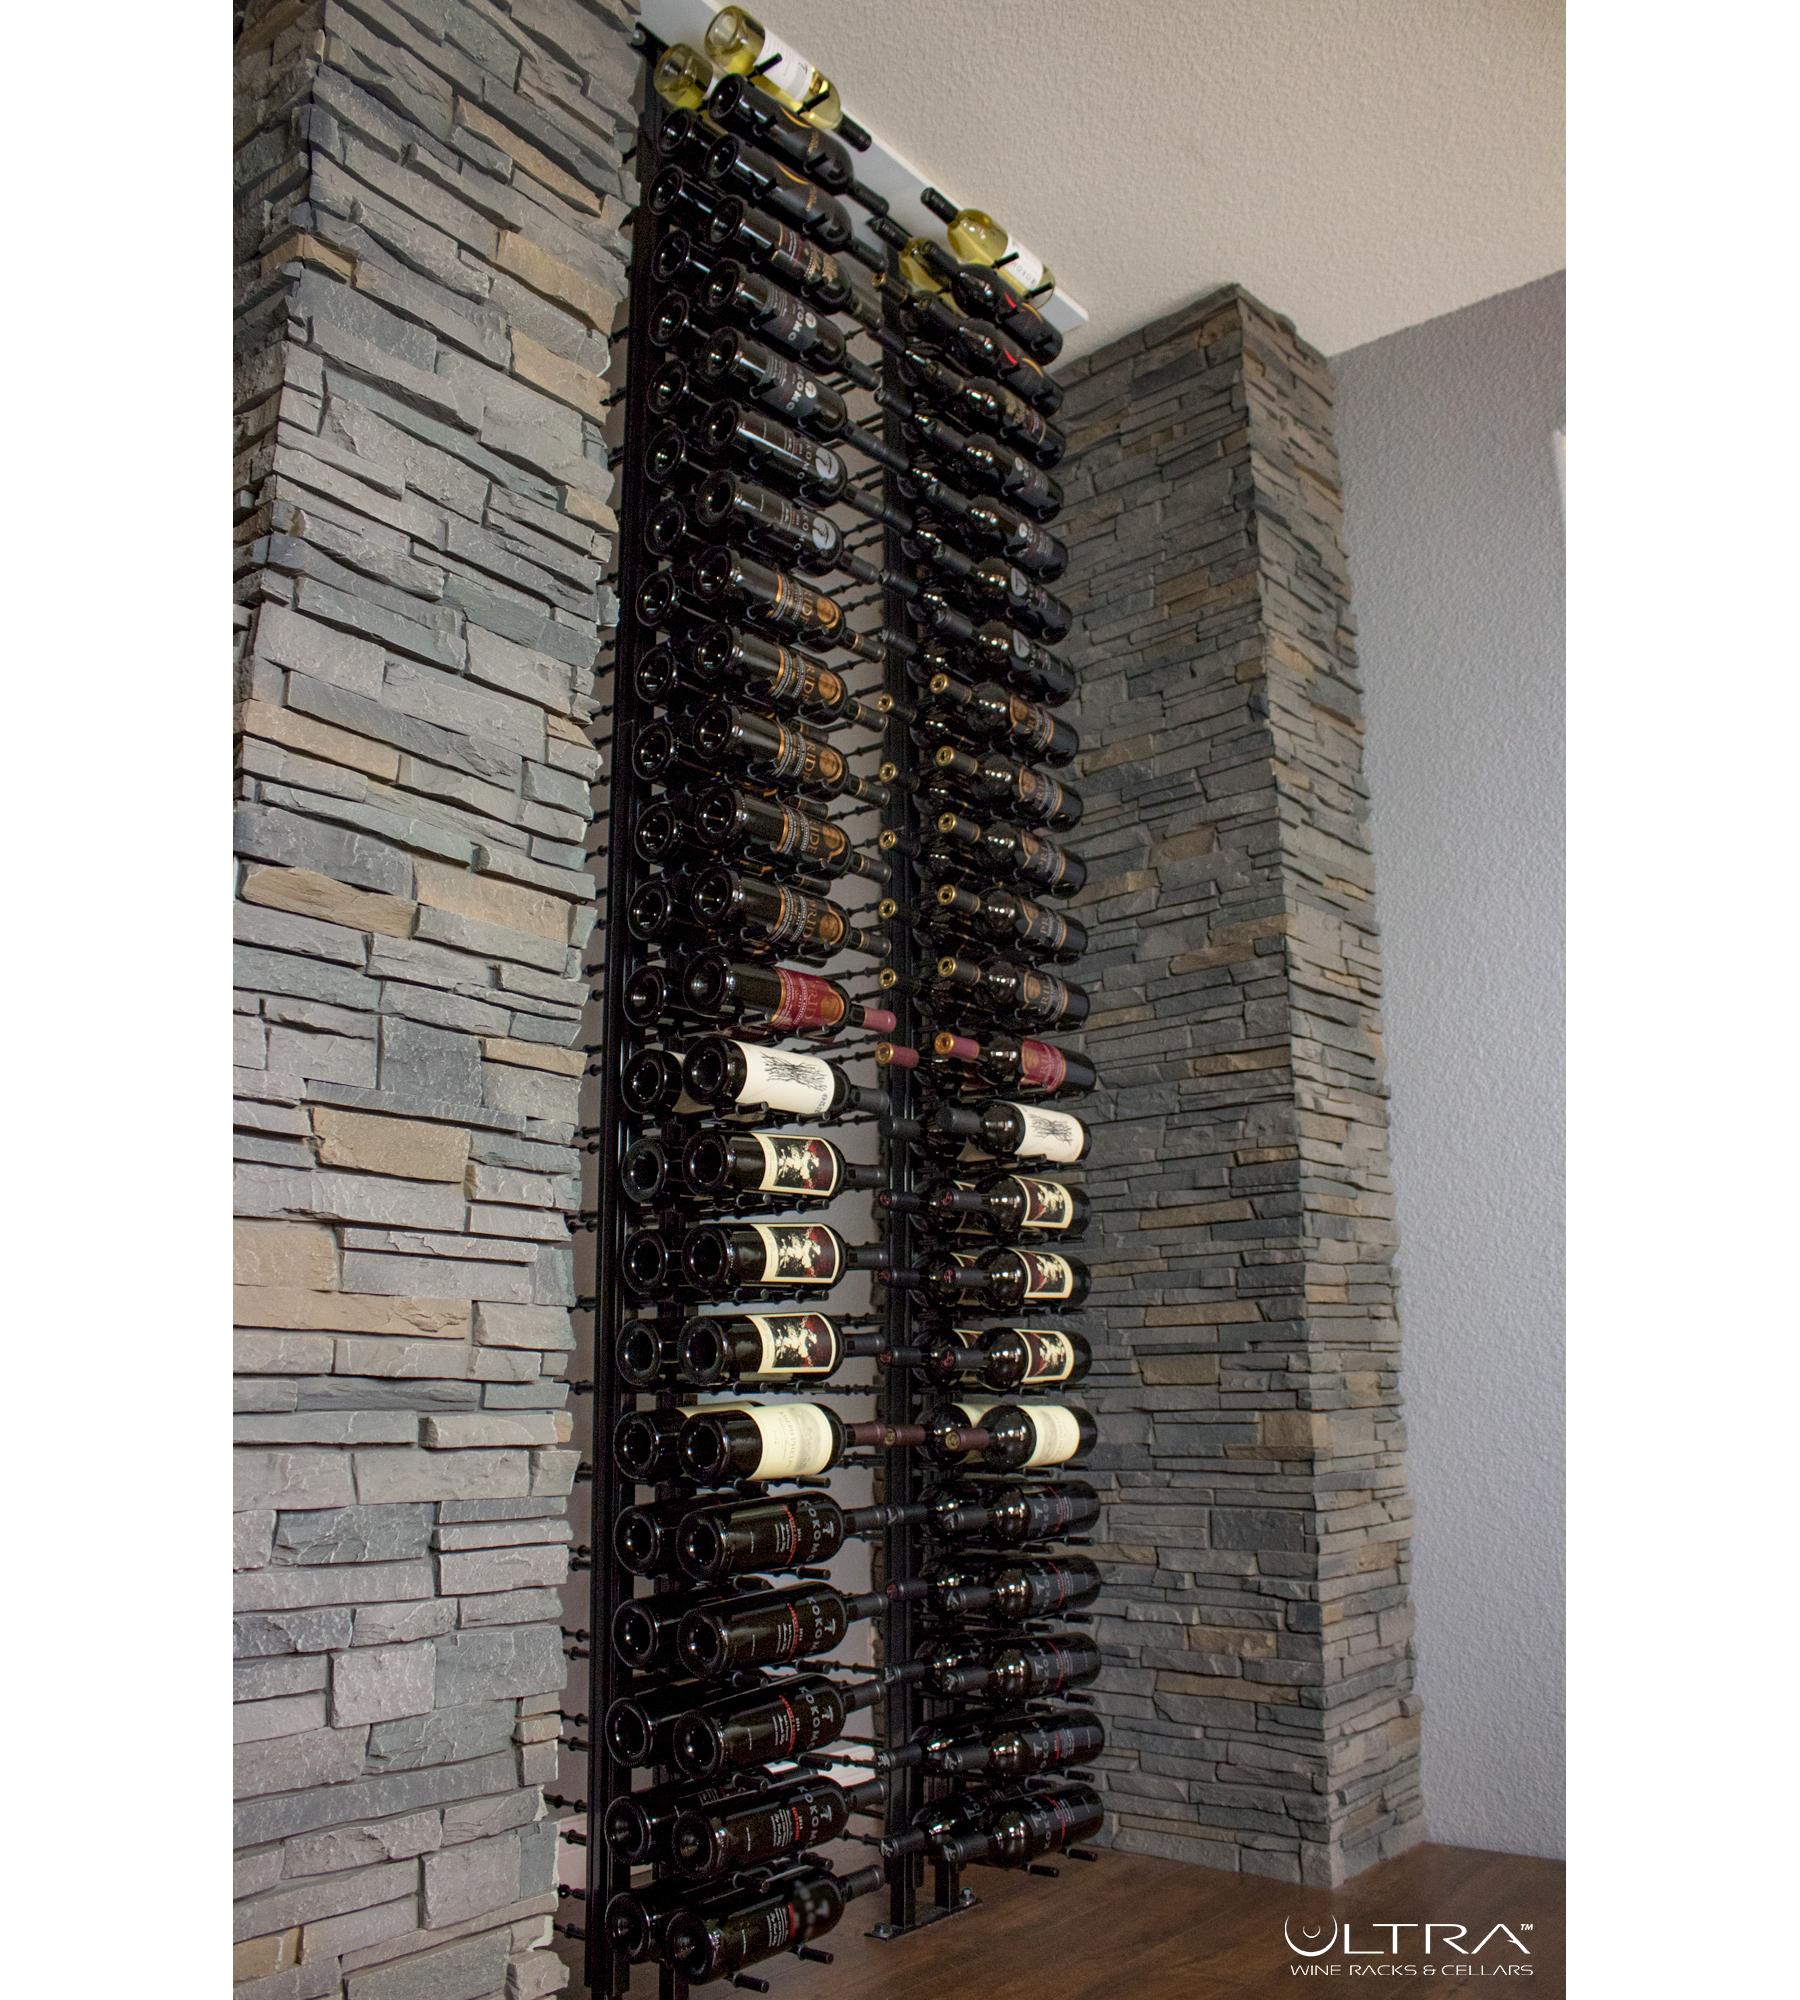 Ultra Floor To Ceiling Wine Rack Wine Rack Wine Cellar Design Cellar Design